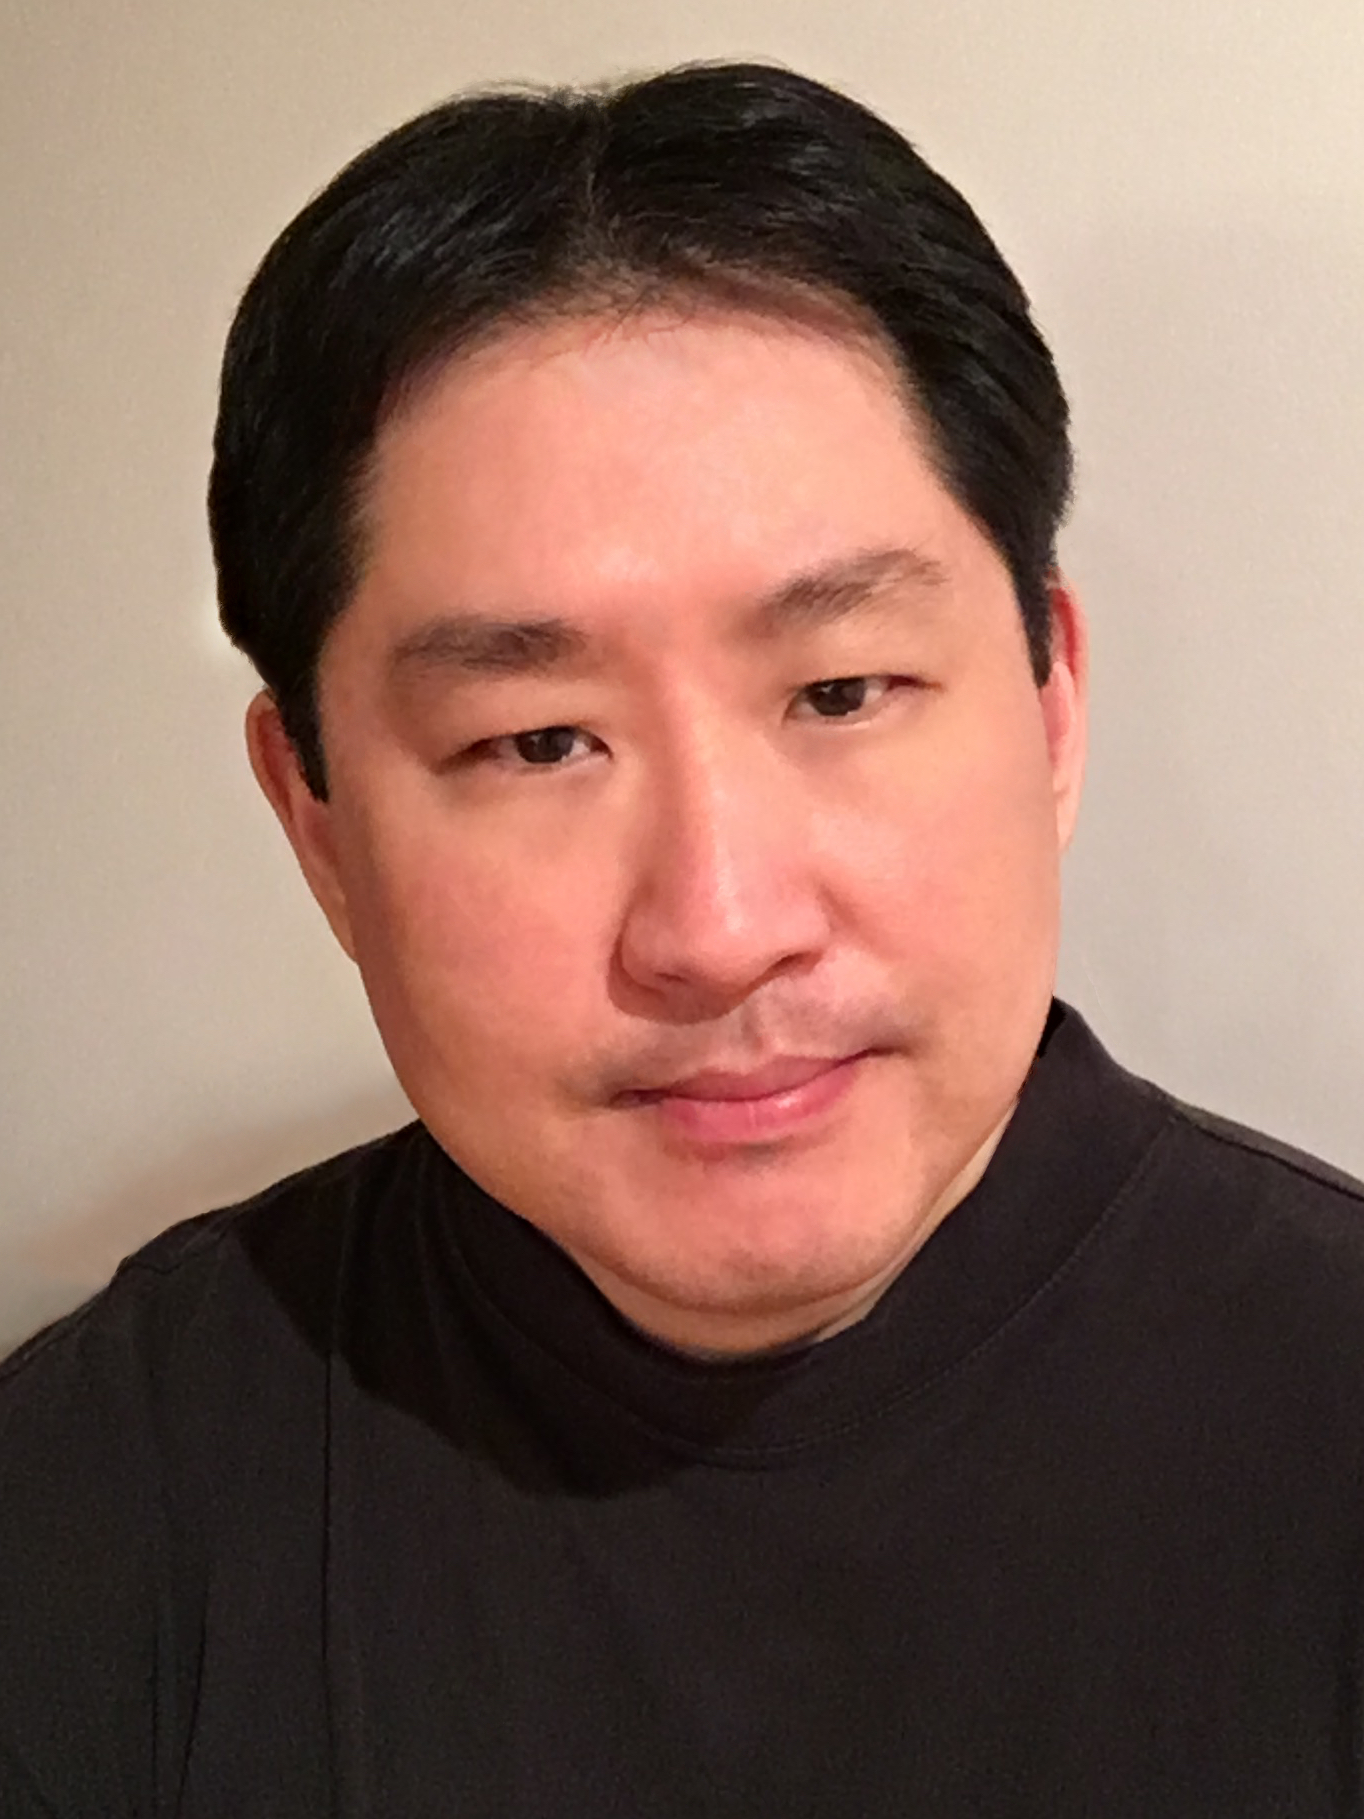 Edmund_Choi_Film_Composer.jpg